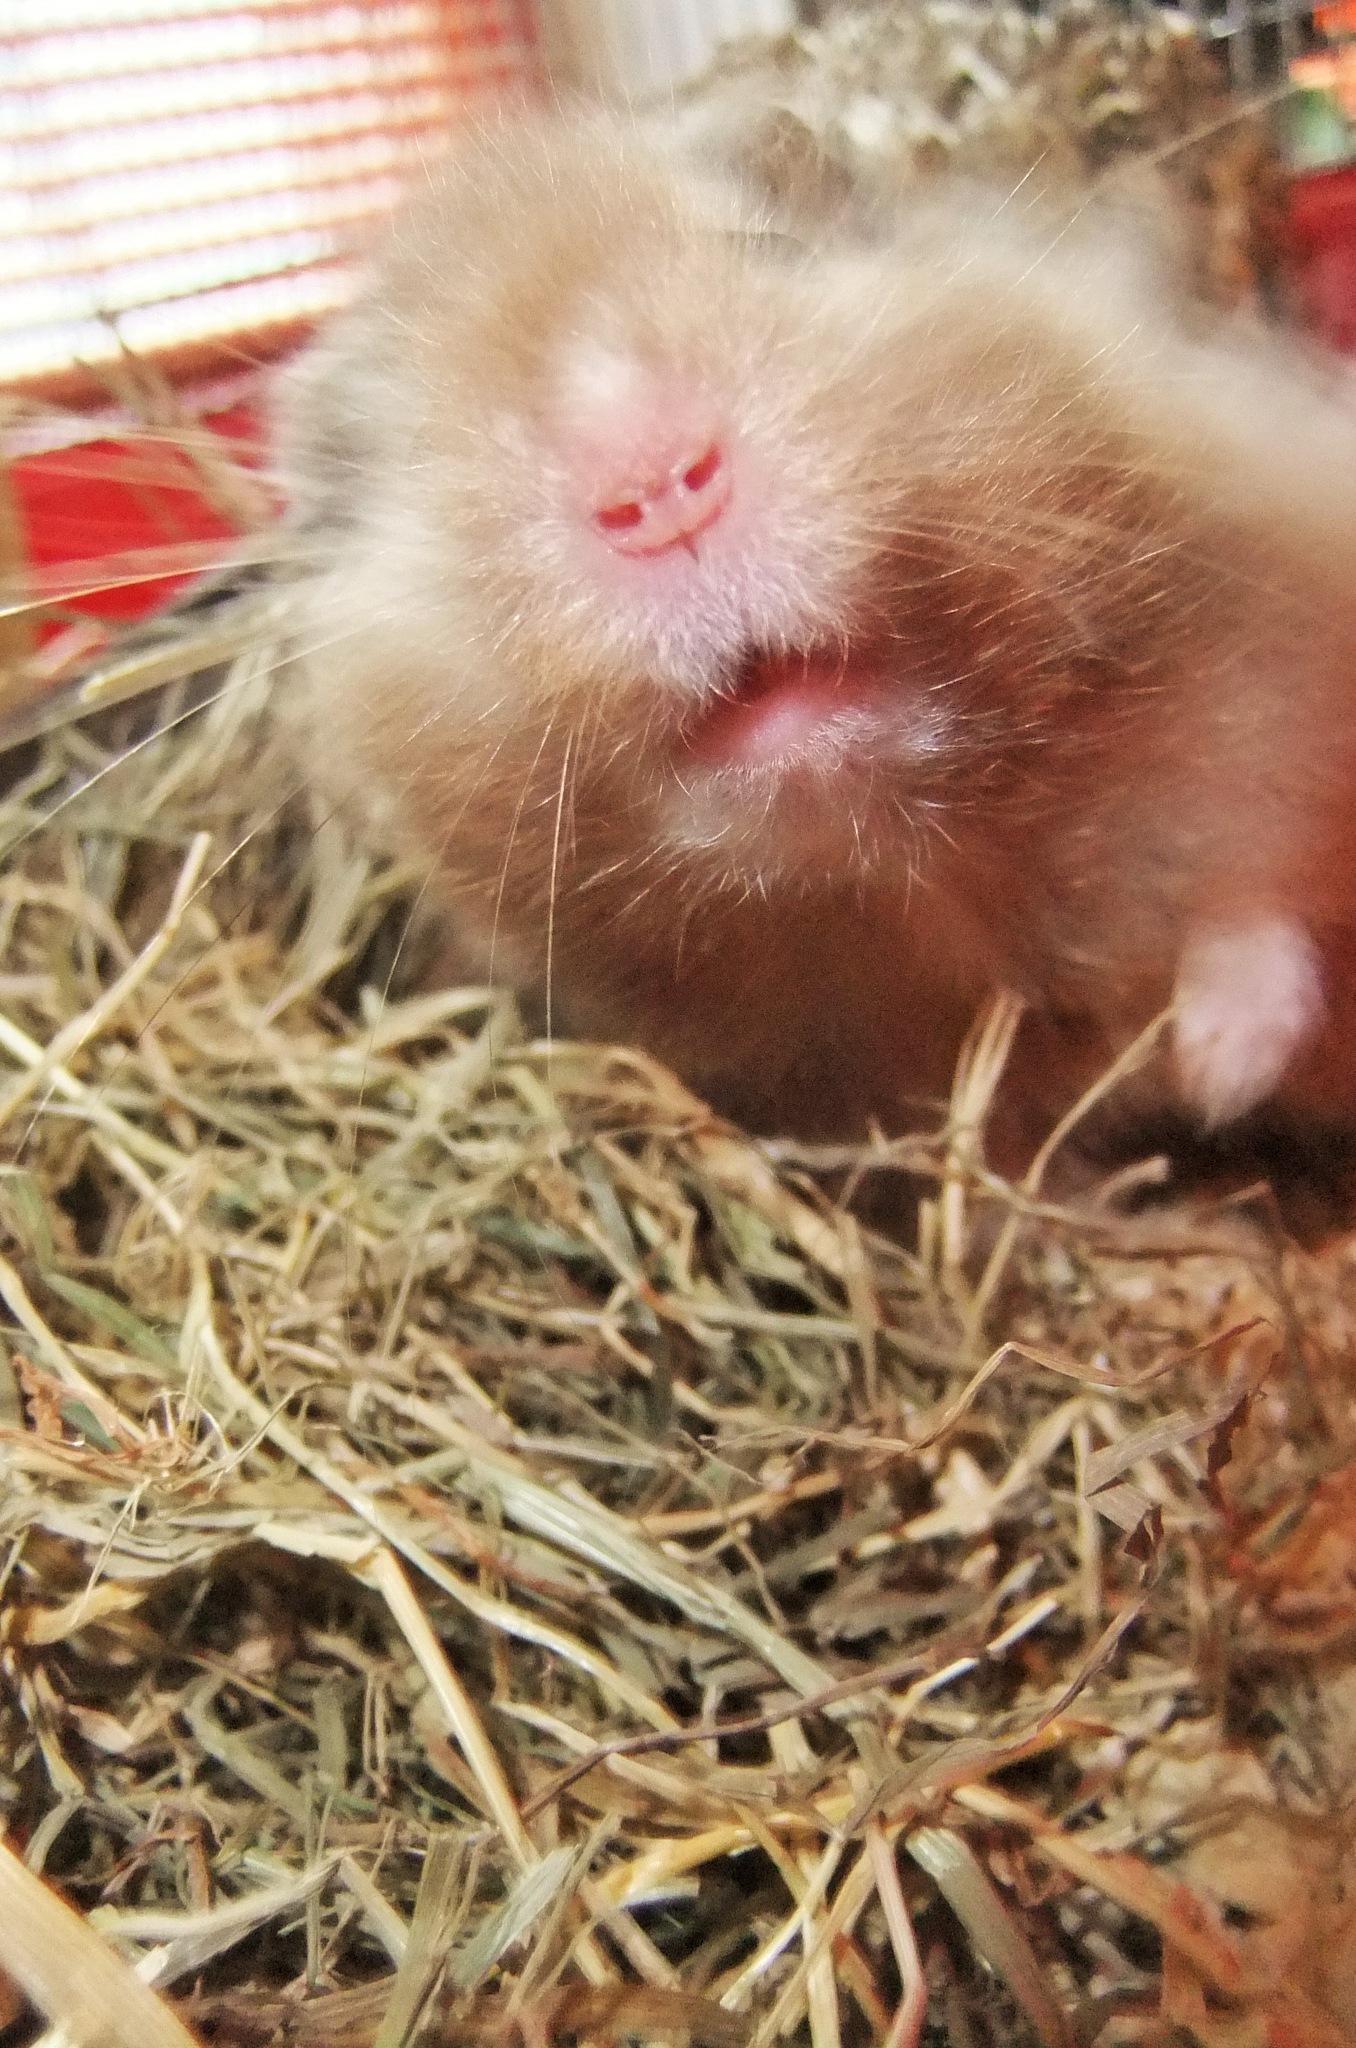 bear hamster little nose by Oliver Neumann